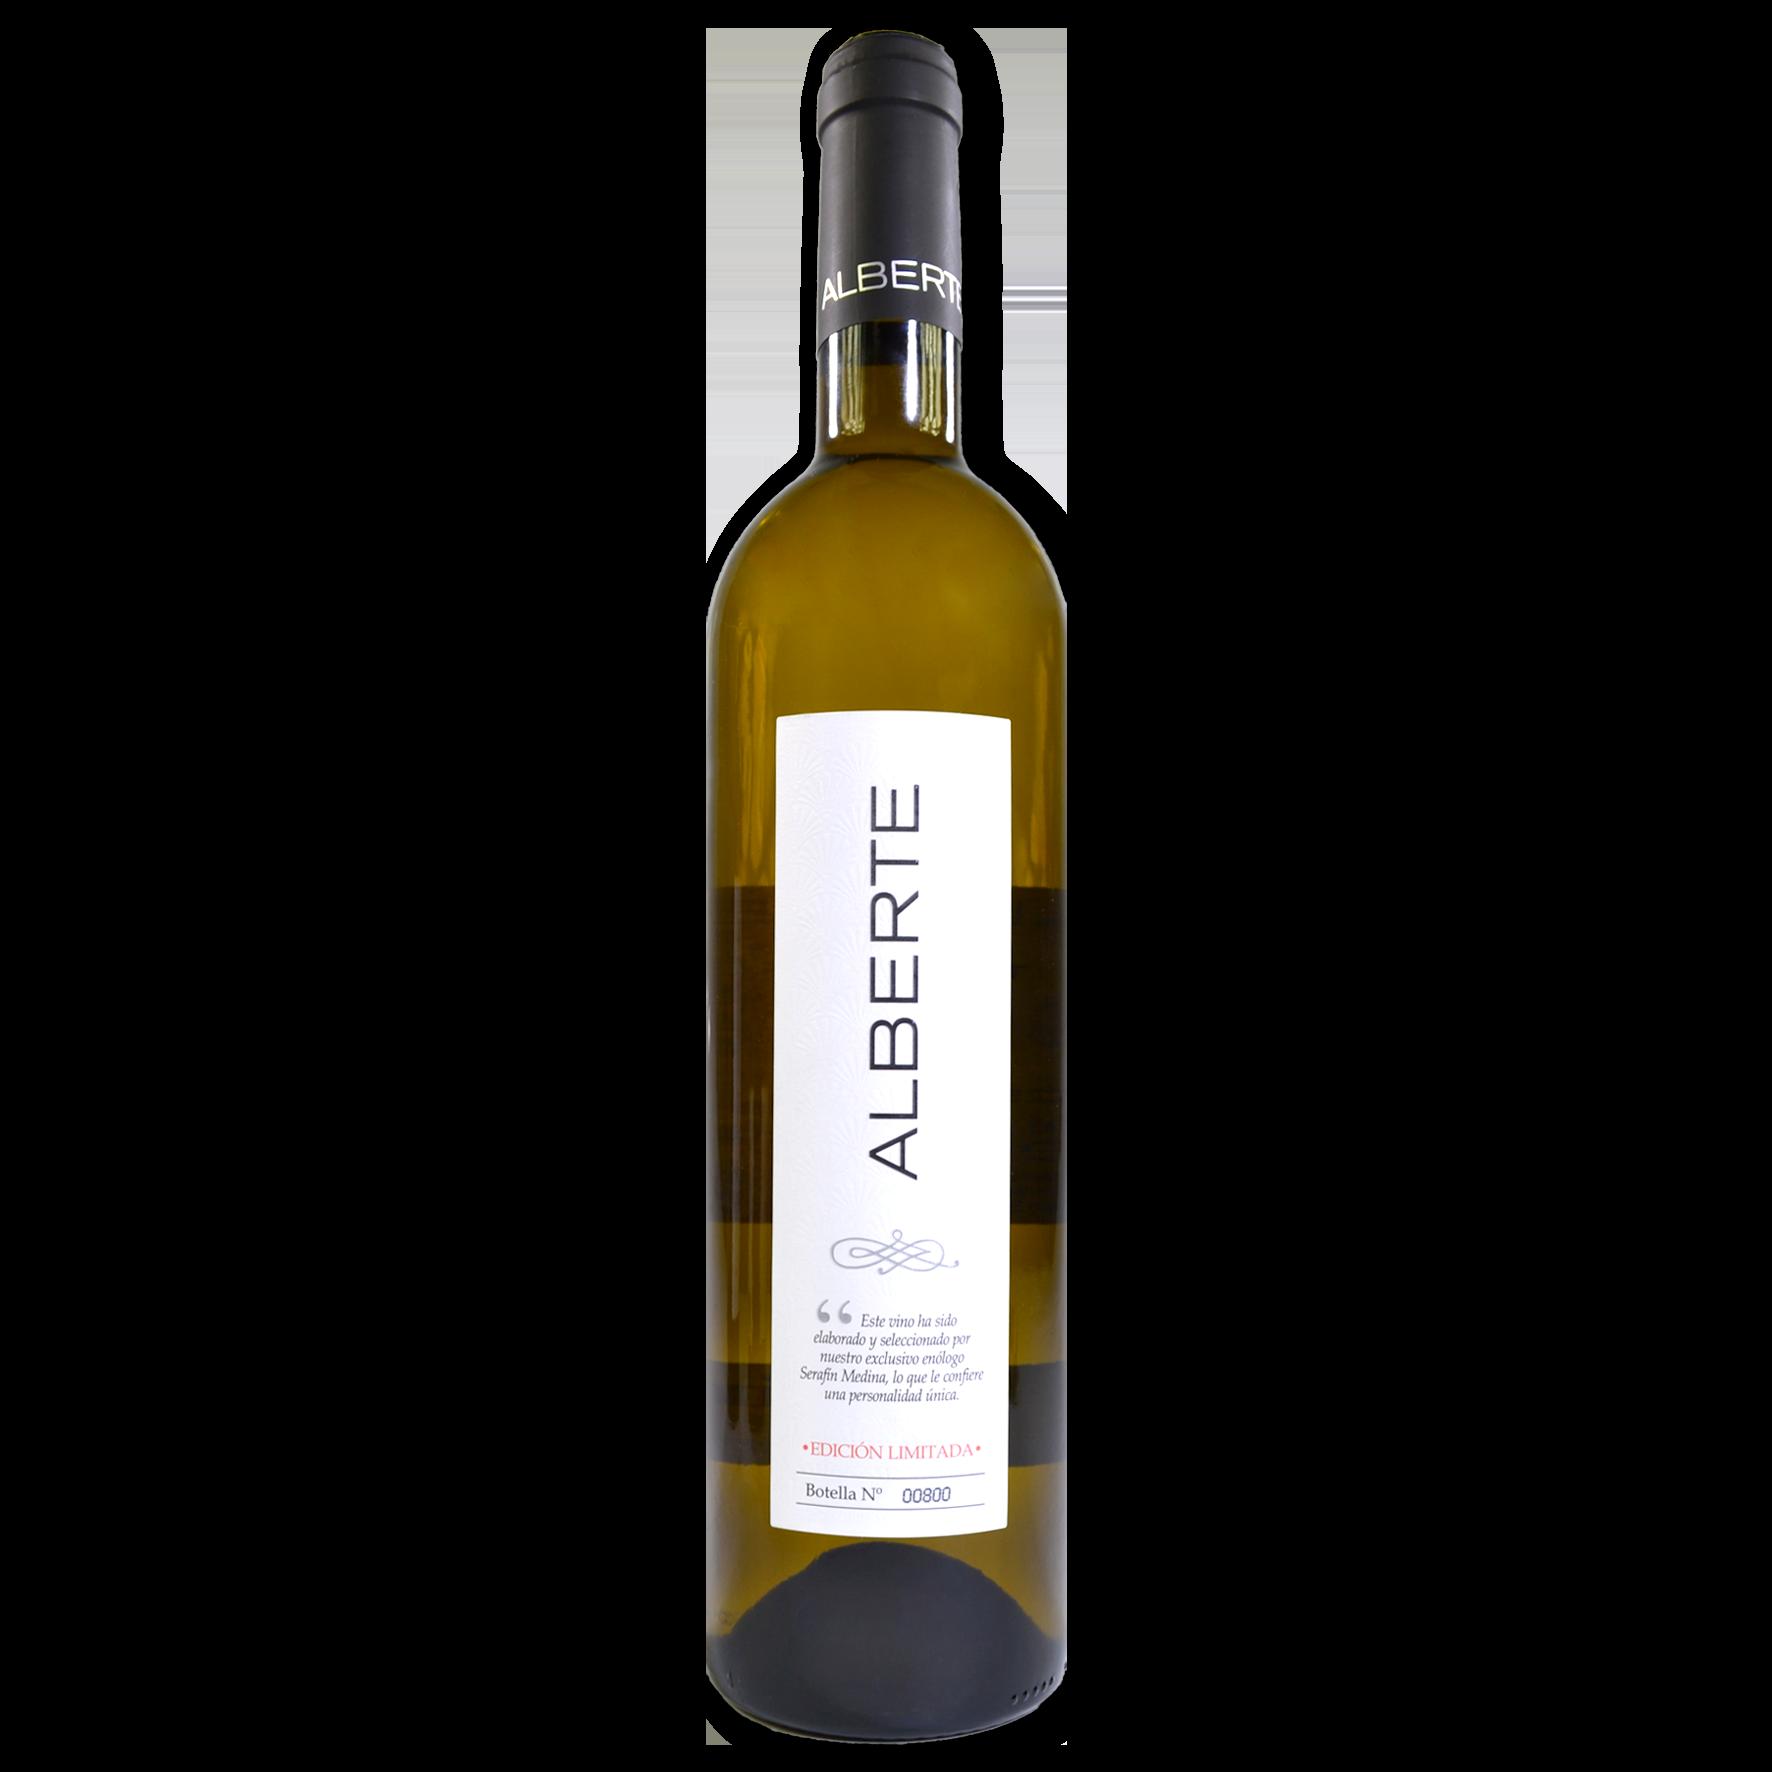 Vino blanco Alberte DO Ribeiro